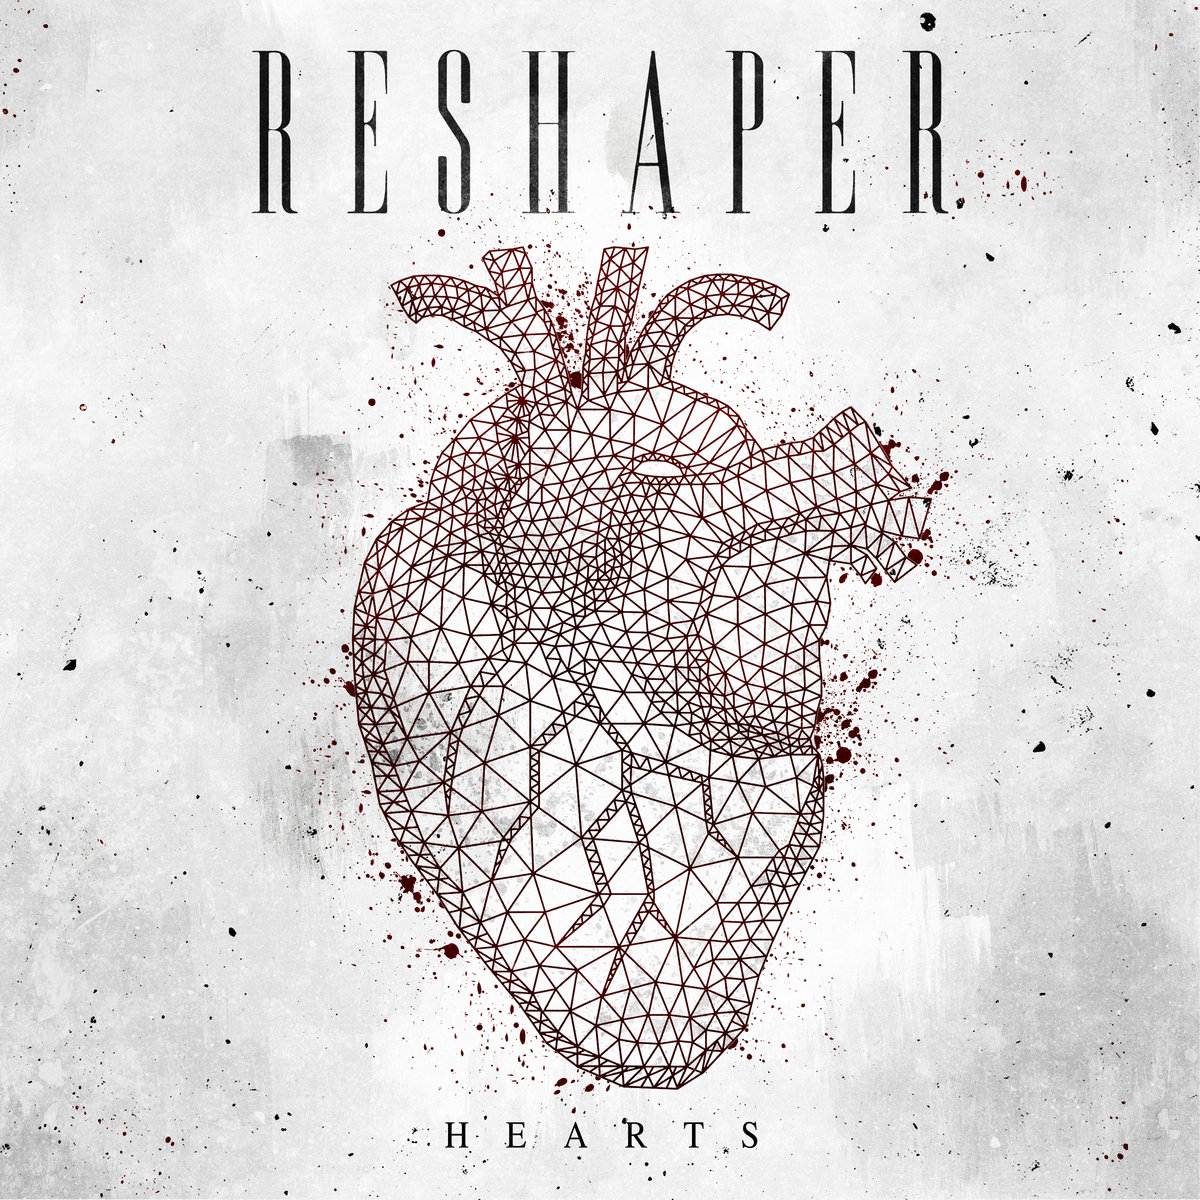 RESHAPER - Hearts [EP] (2016)